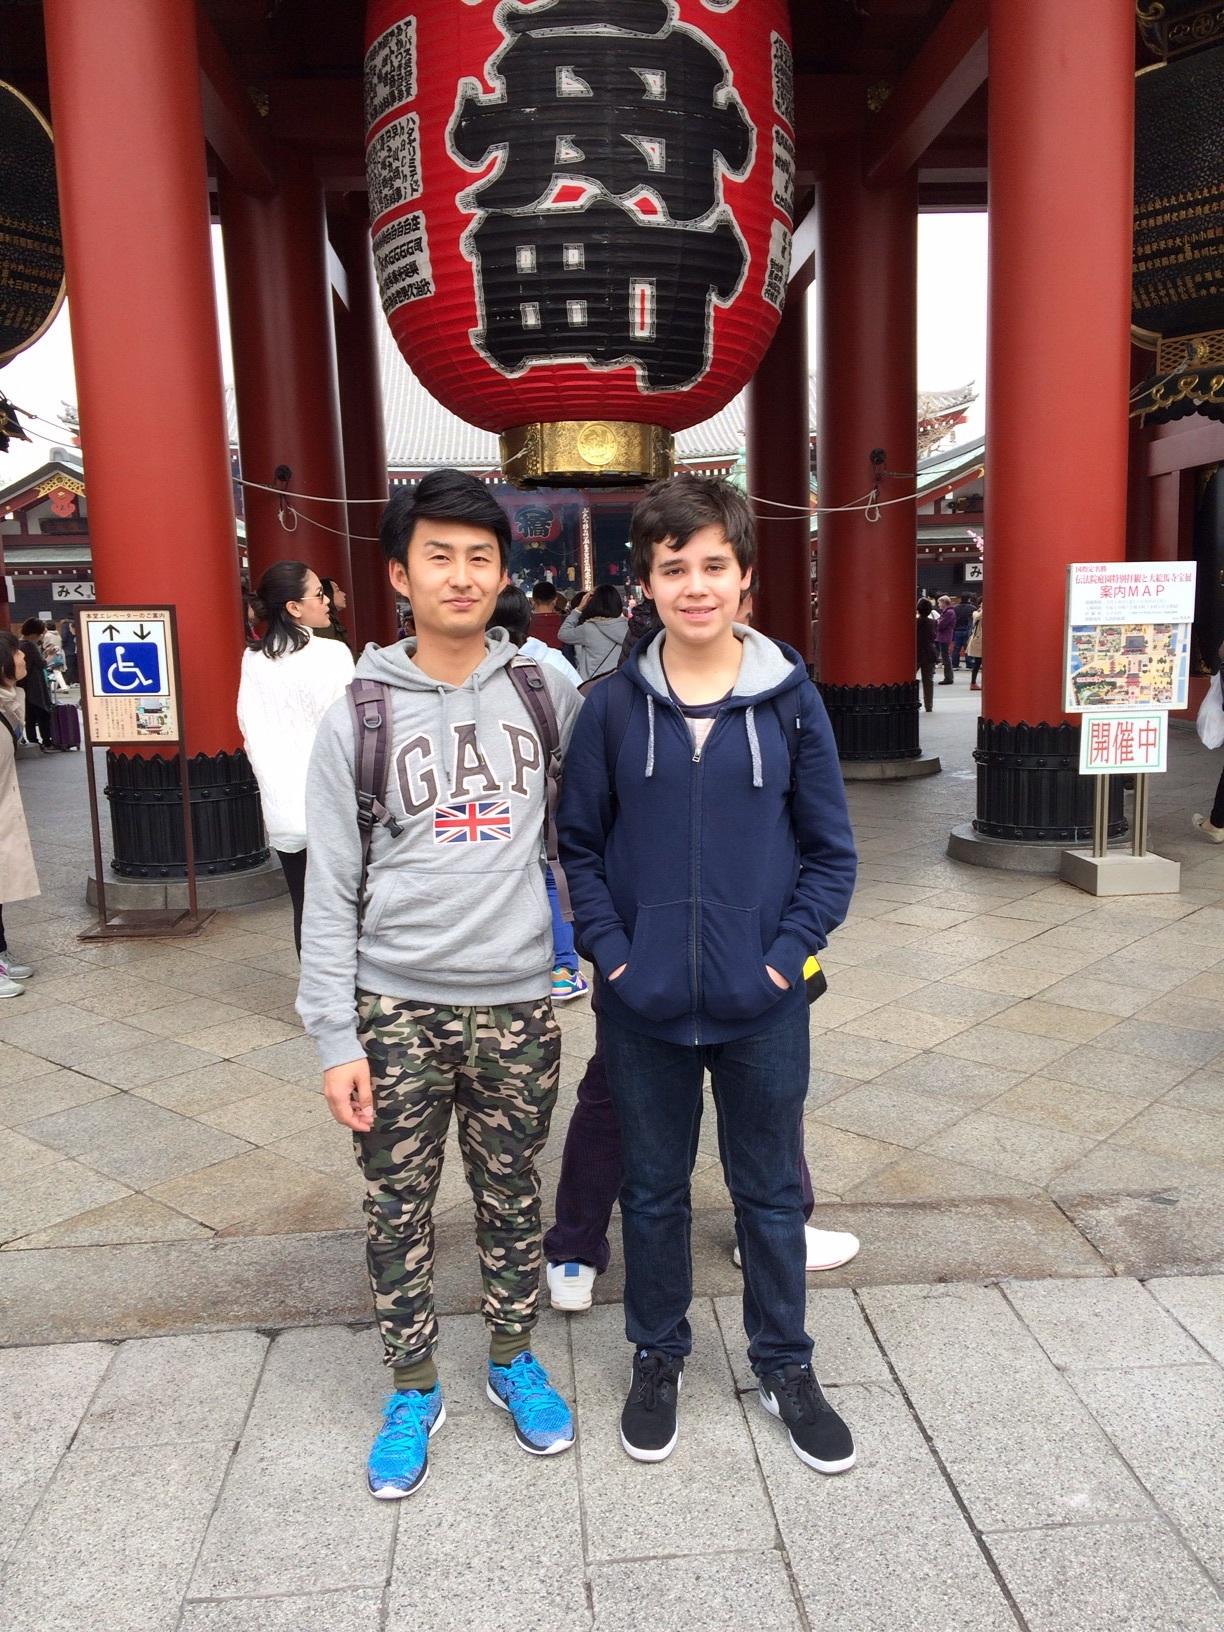 Takumi and Sam